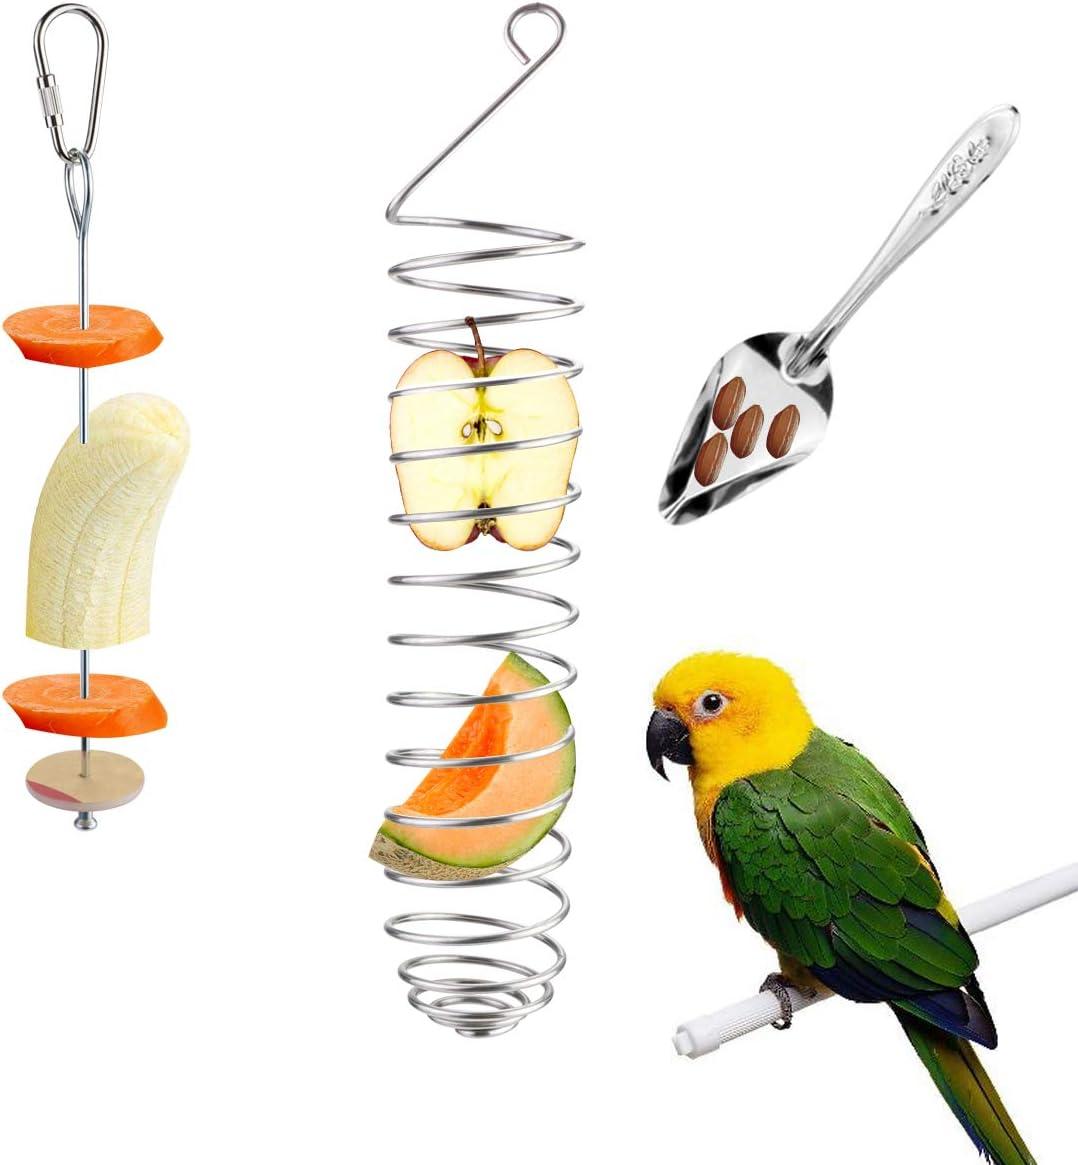 LeonBach 3 Pack Bird Food Holder Set, Stainless Steel Bird Feeding Spoon Millet Holder Foraging Toys for Parrots